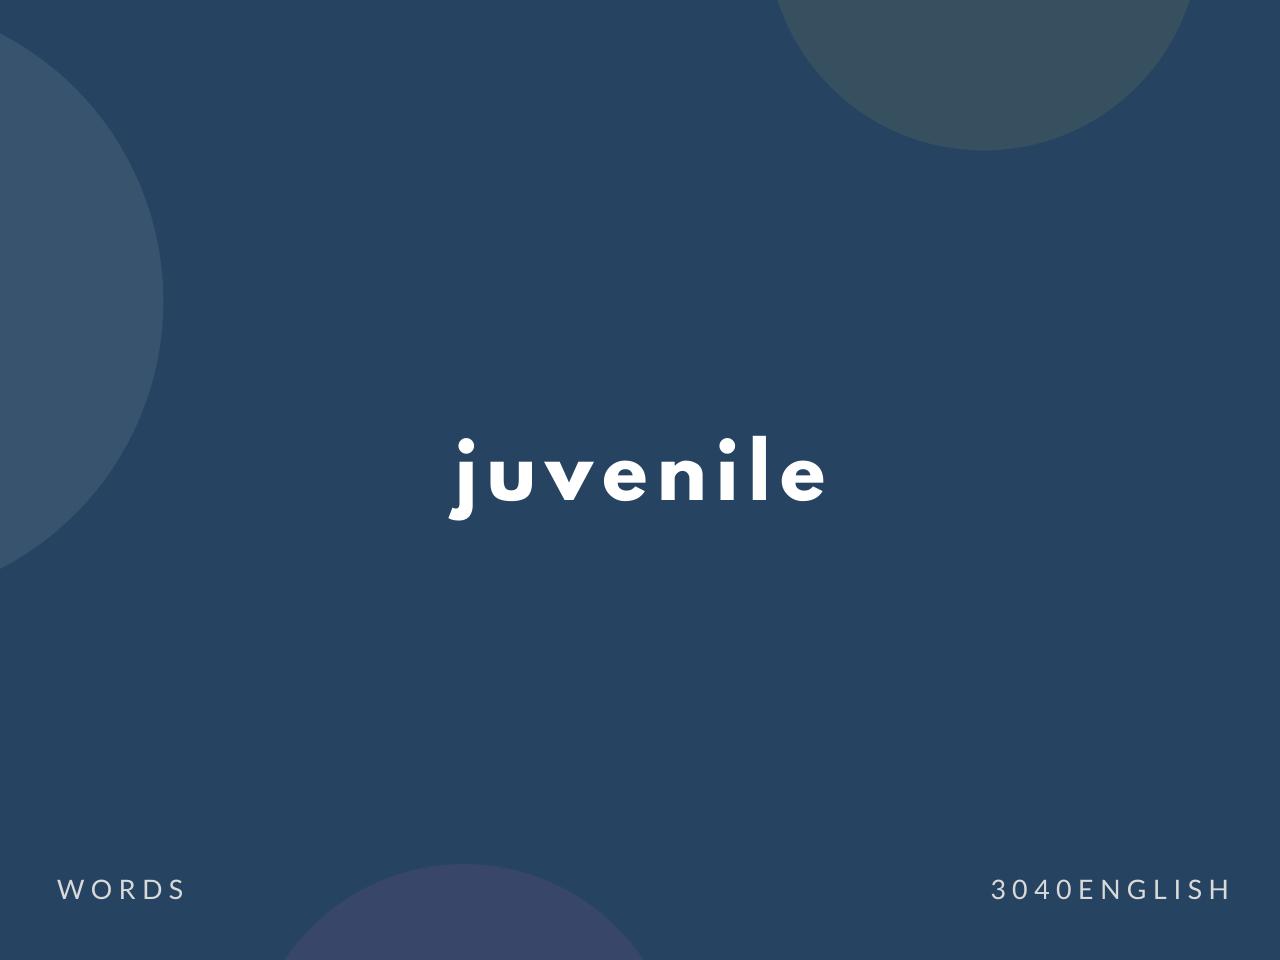 juvenile の意味と簡単な使い方【音読用例文あり】